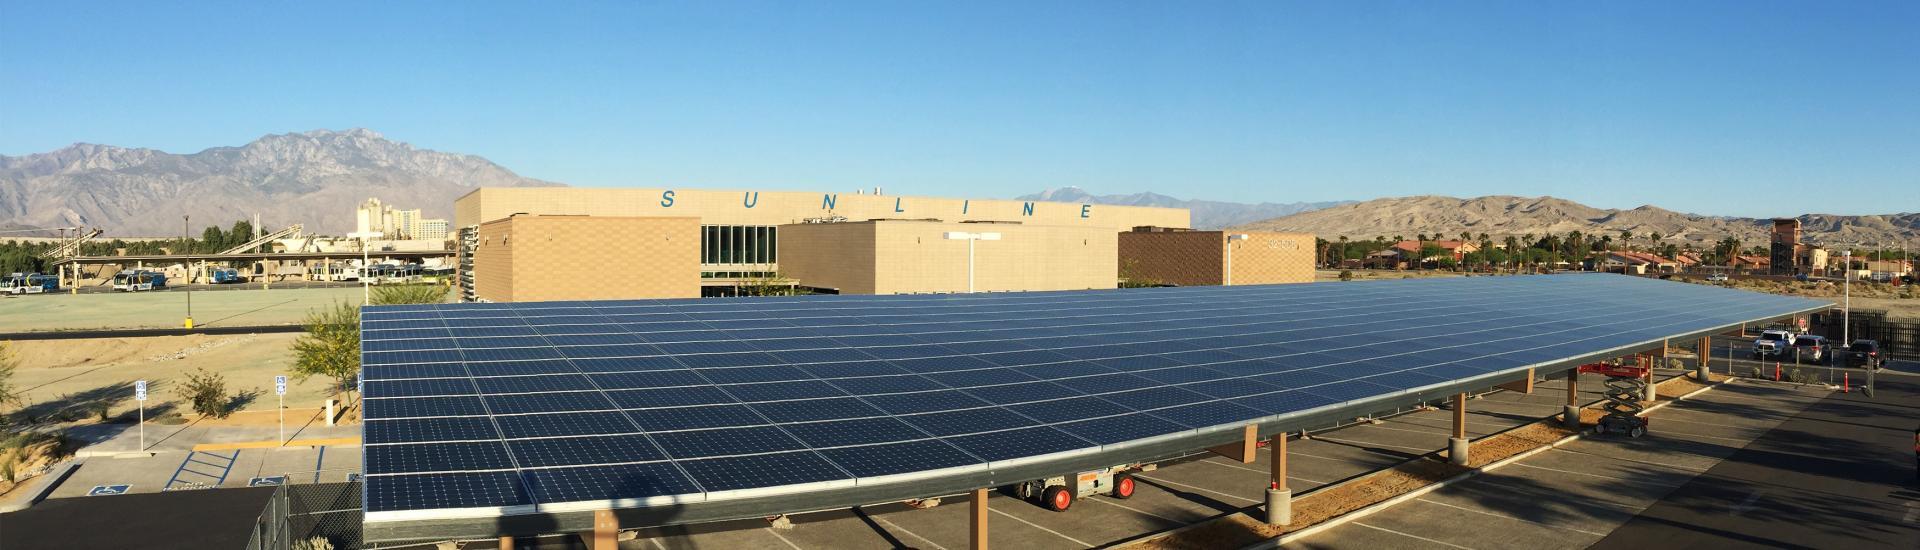 Admin Bldg Solar Panel